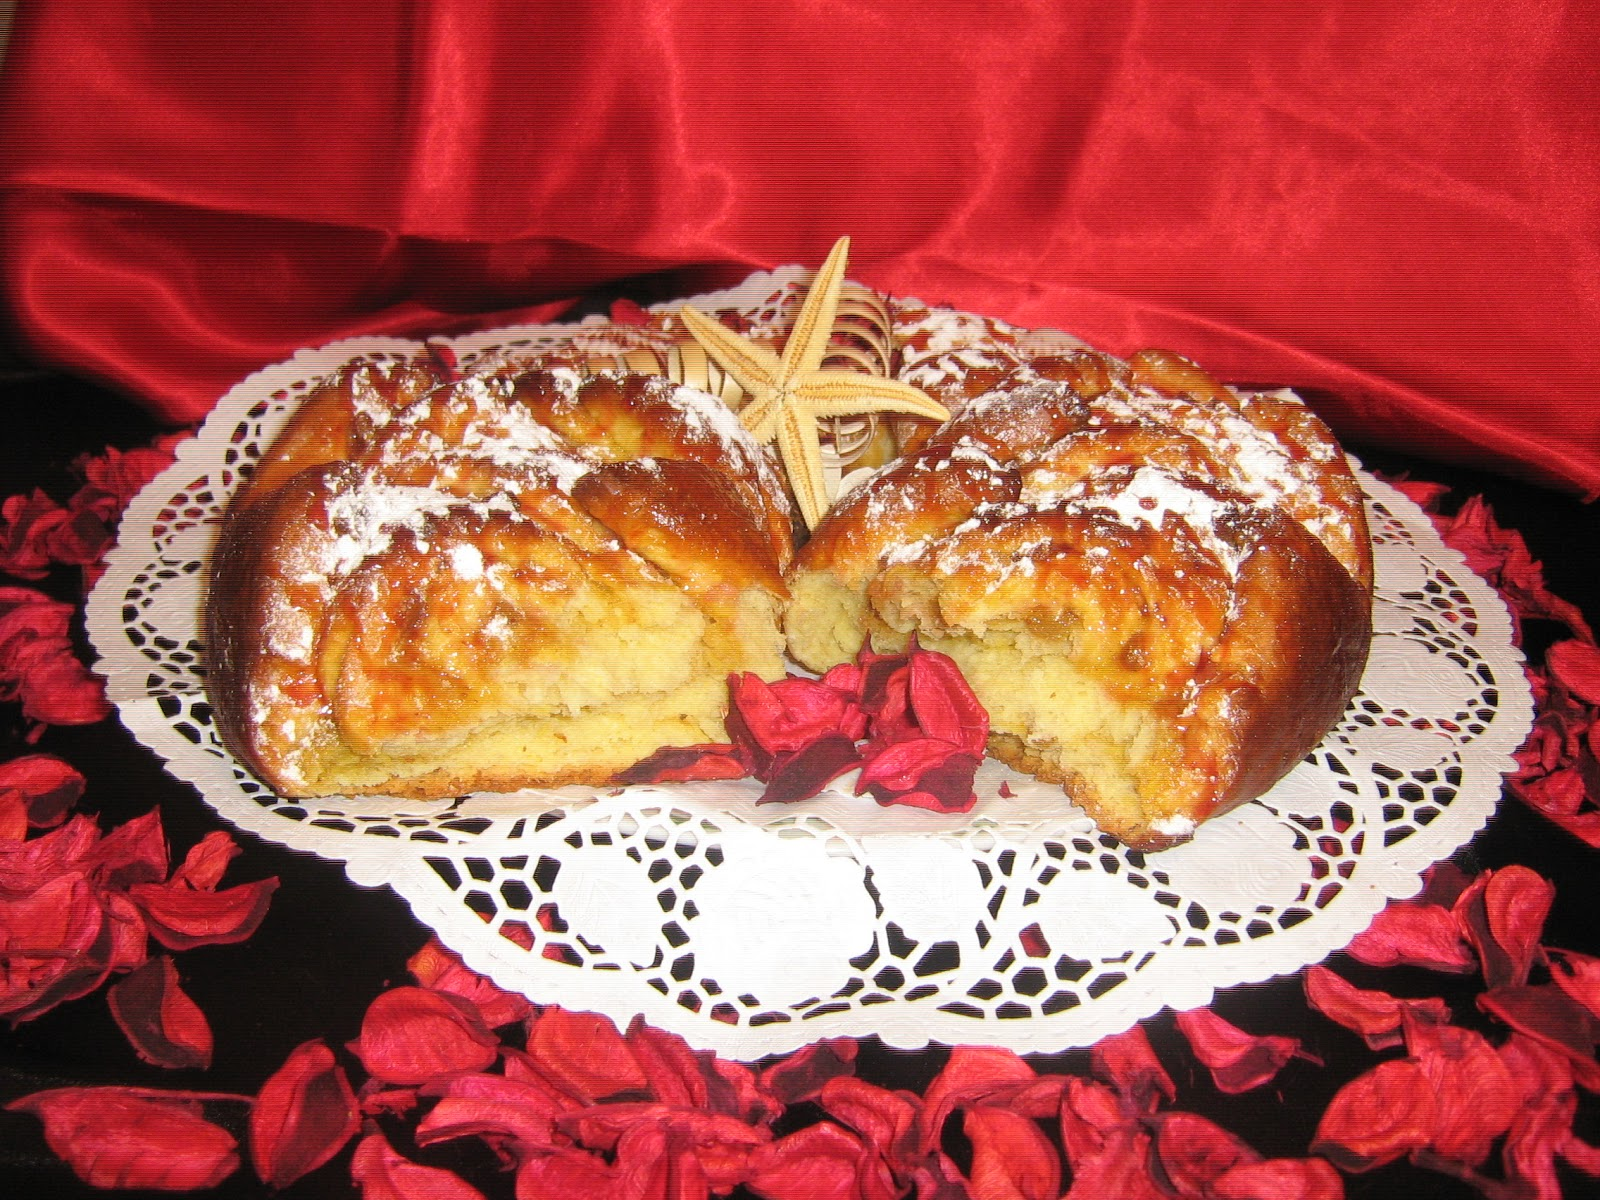 Easy Recipes: New Year's Homemade Sweet Bread